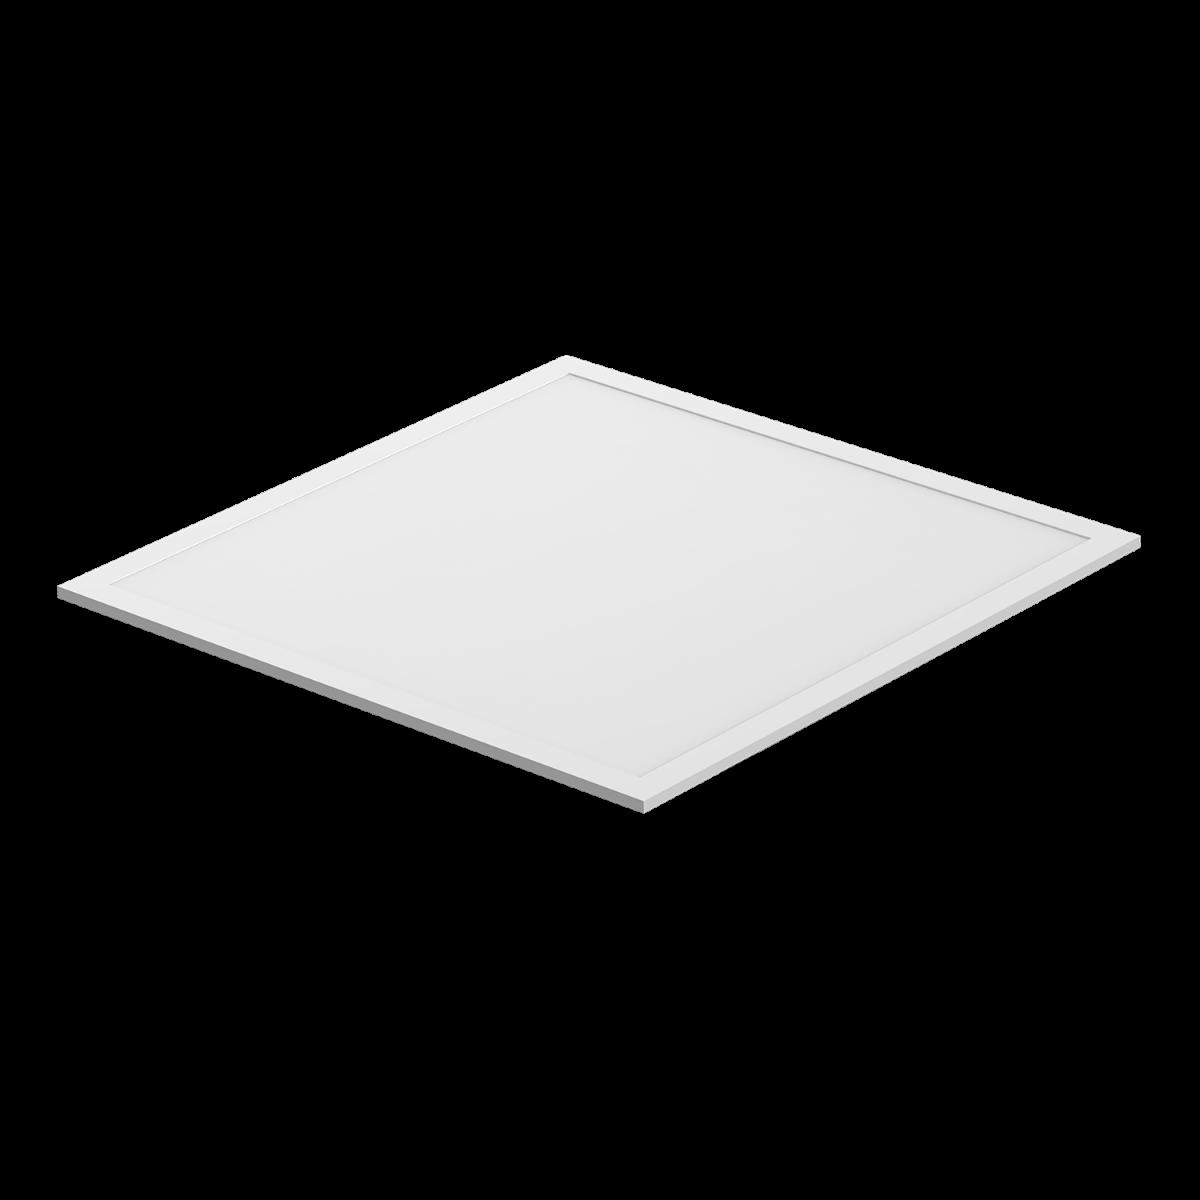 Noxion LED Panel Econox 32W 60x60cm 4000K 4400lm UGR <22 | Cool White - Replaces 4x18W